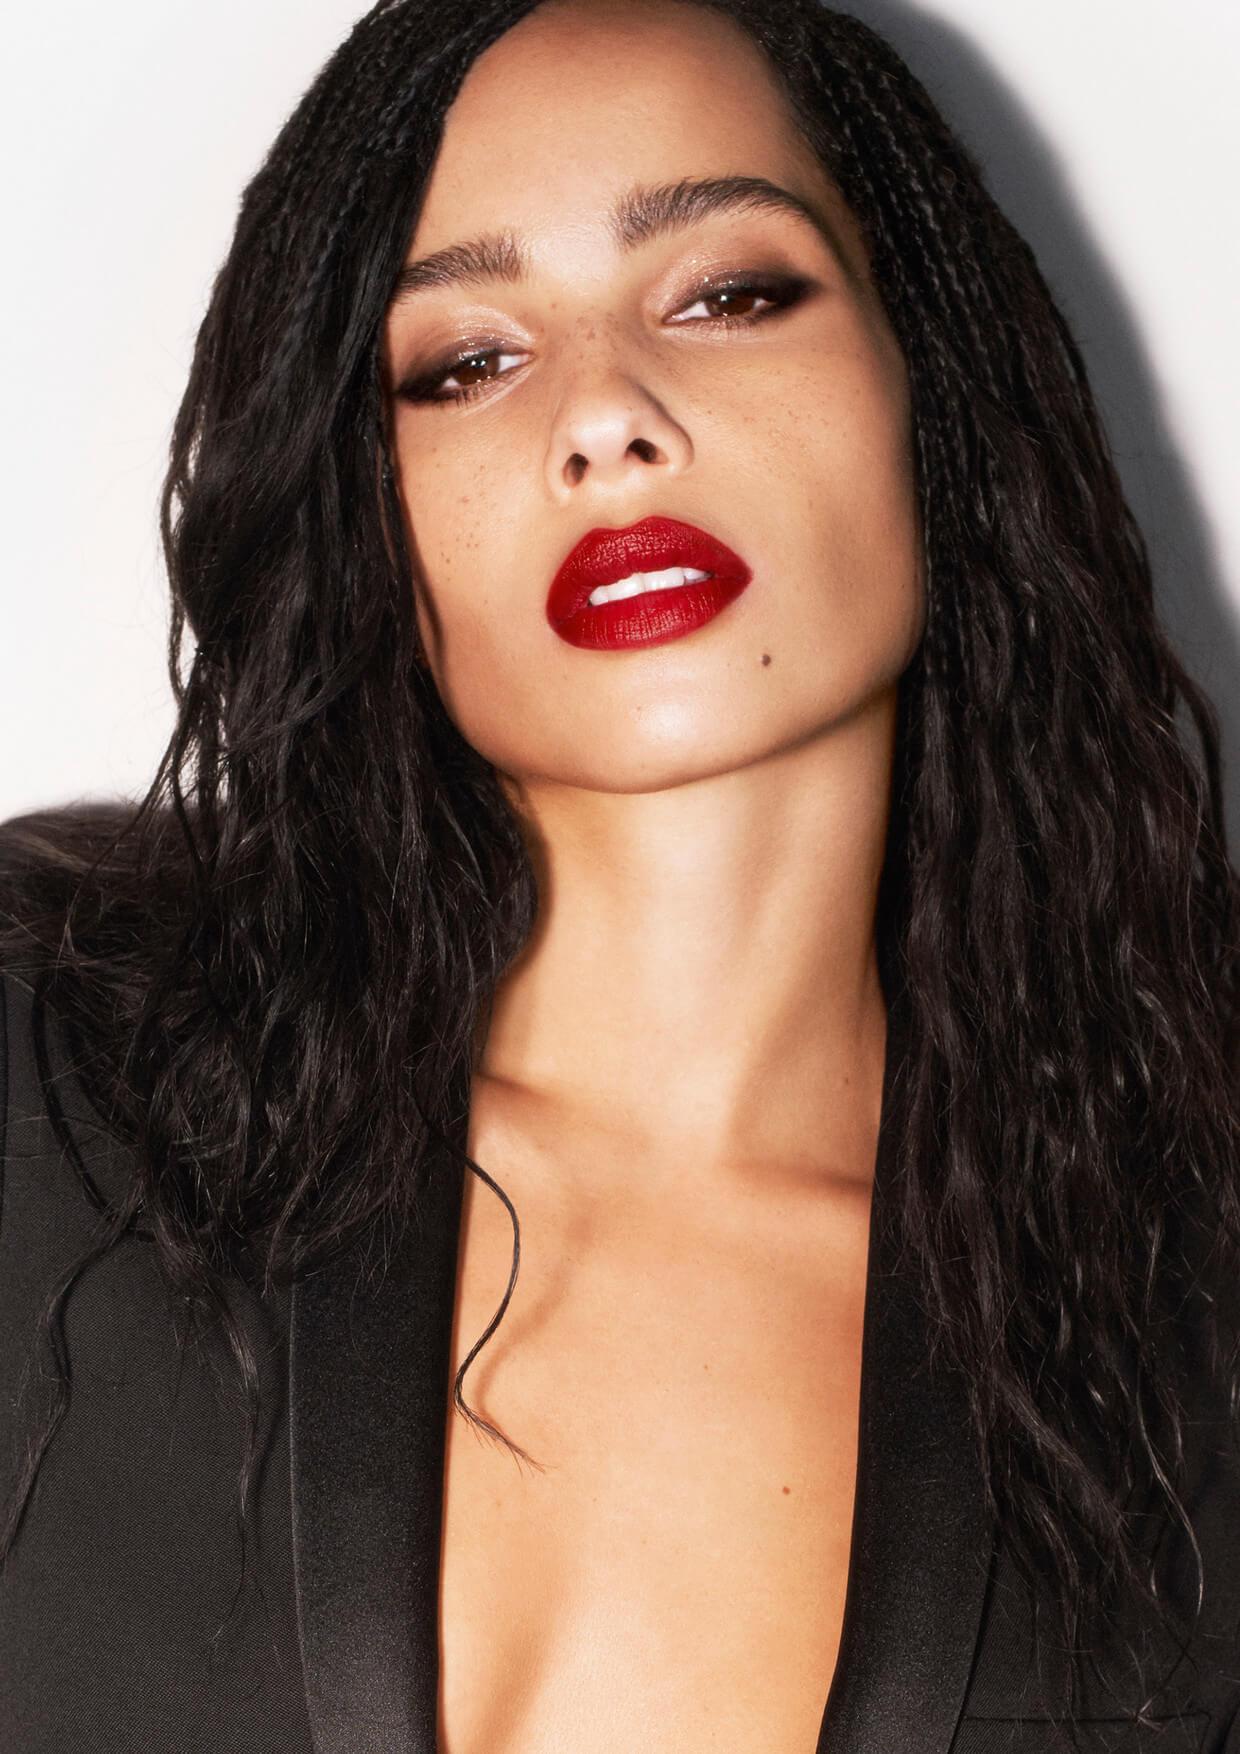 YSL Pur Couture Zoe Kravitz